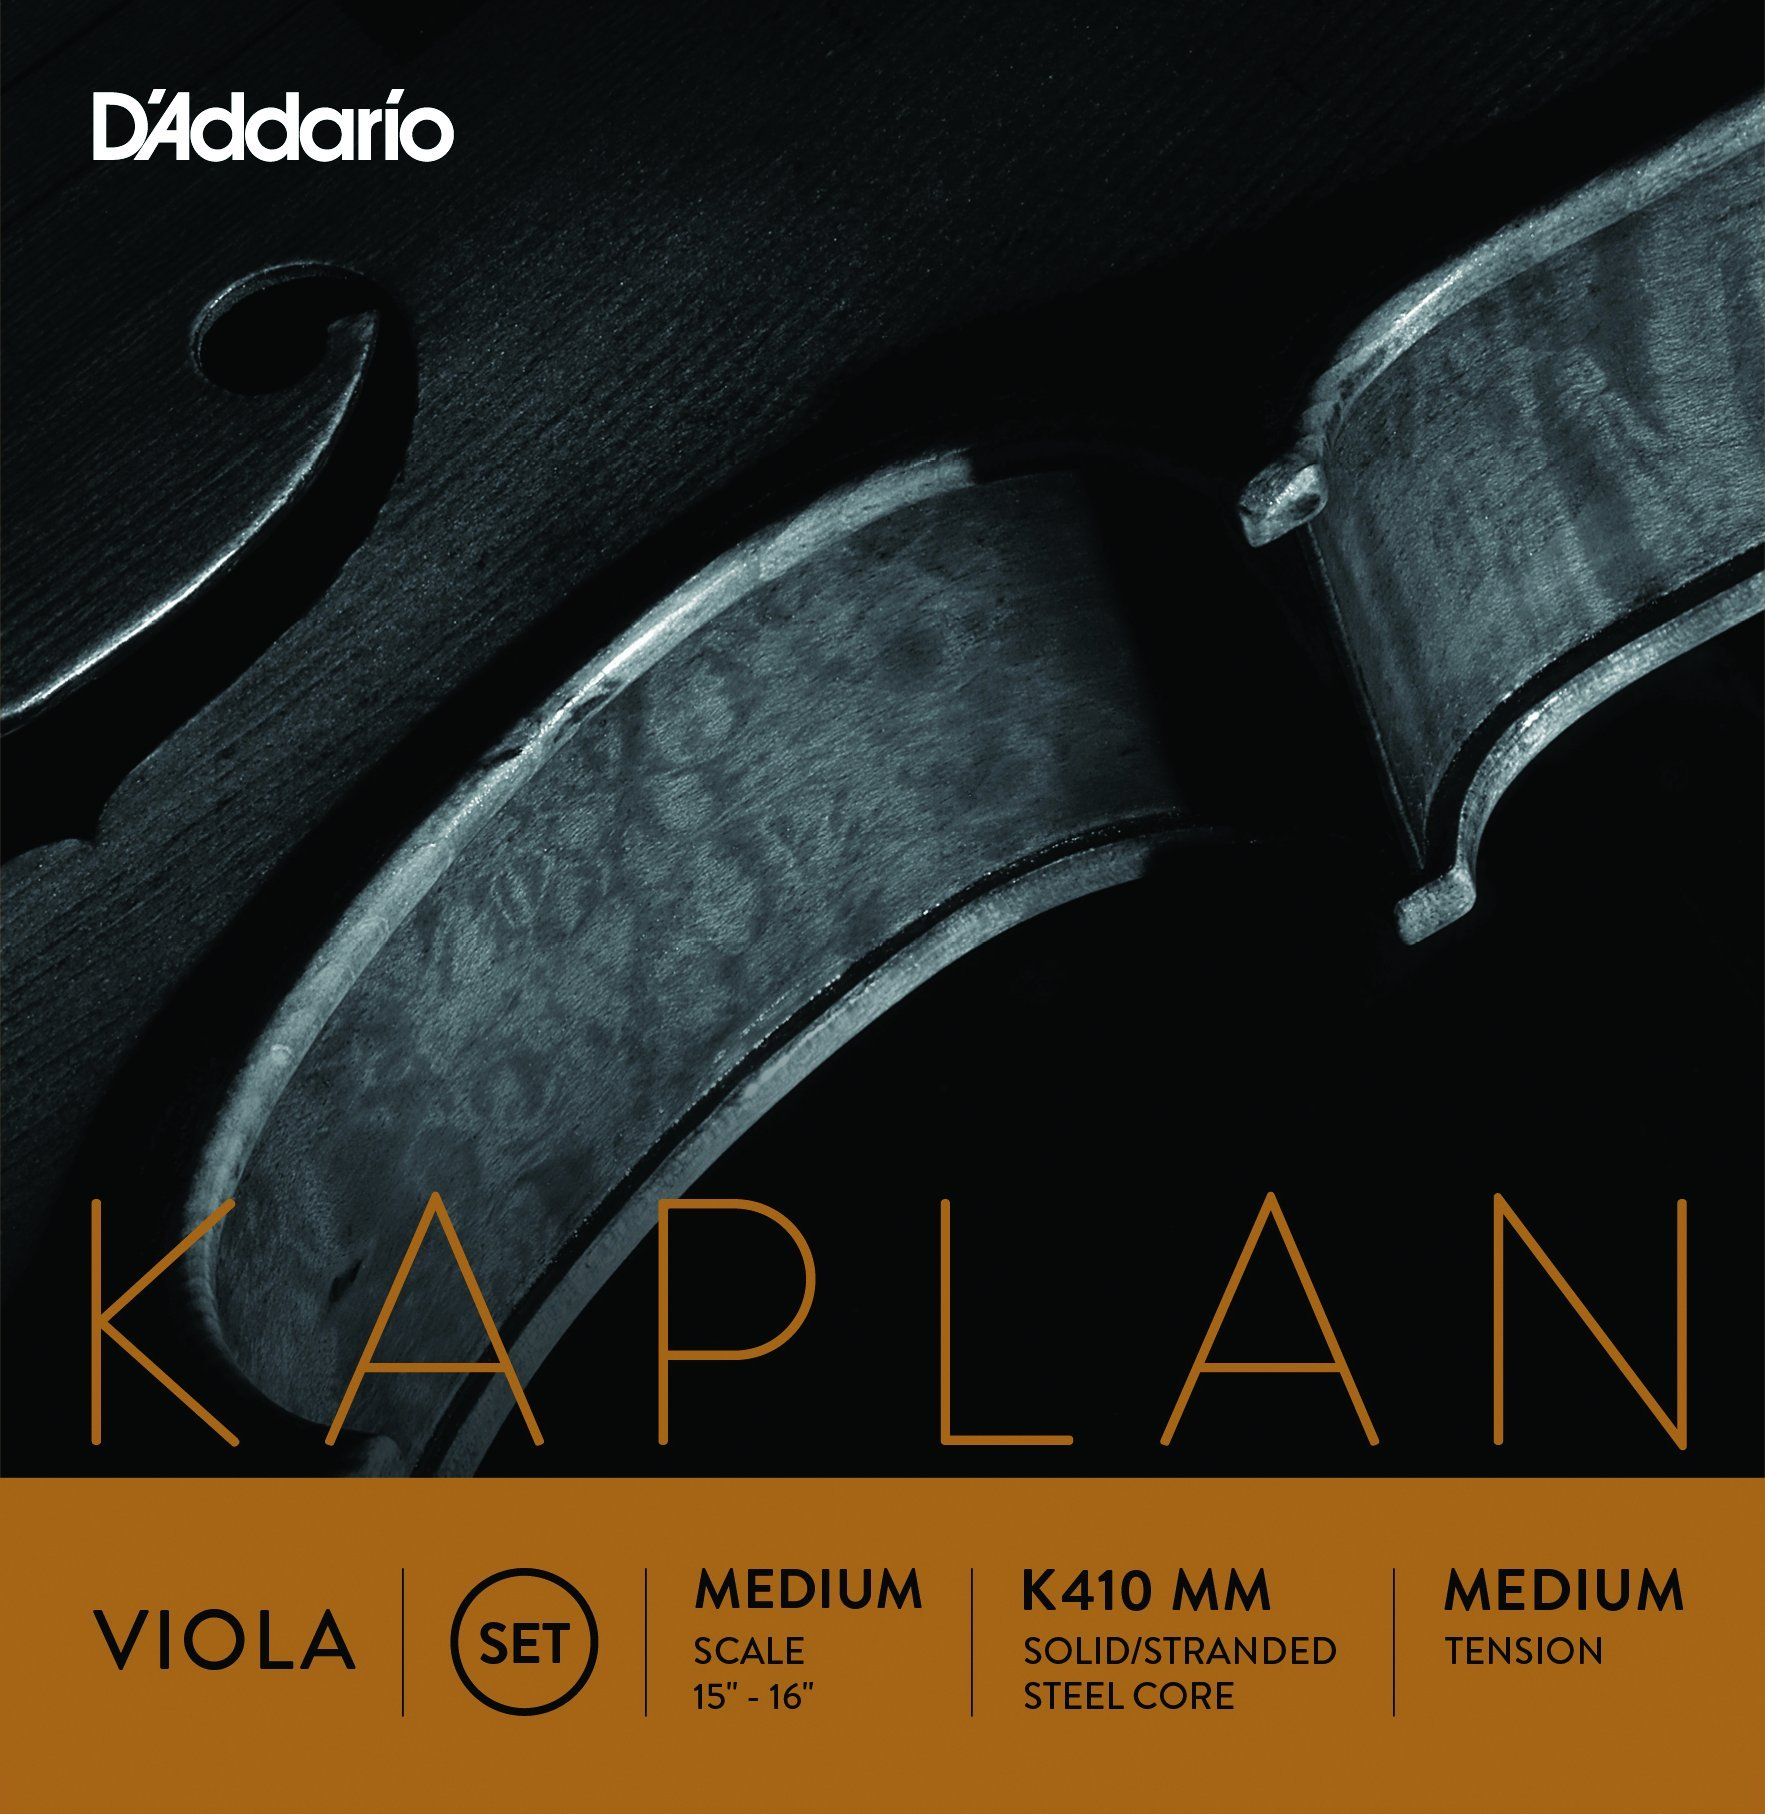 D'Addario Kaplan Viola String Set, Medium Scale, Medium Tension